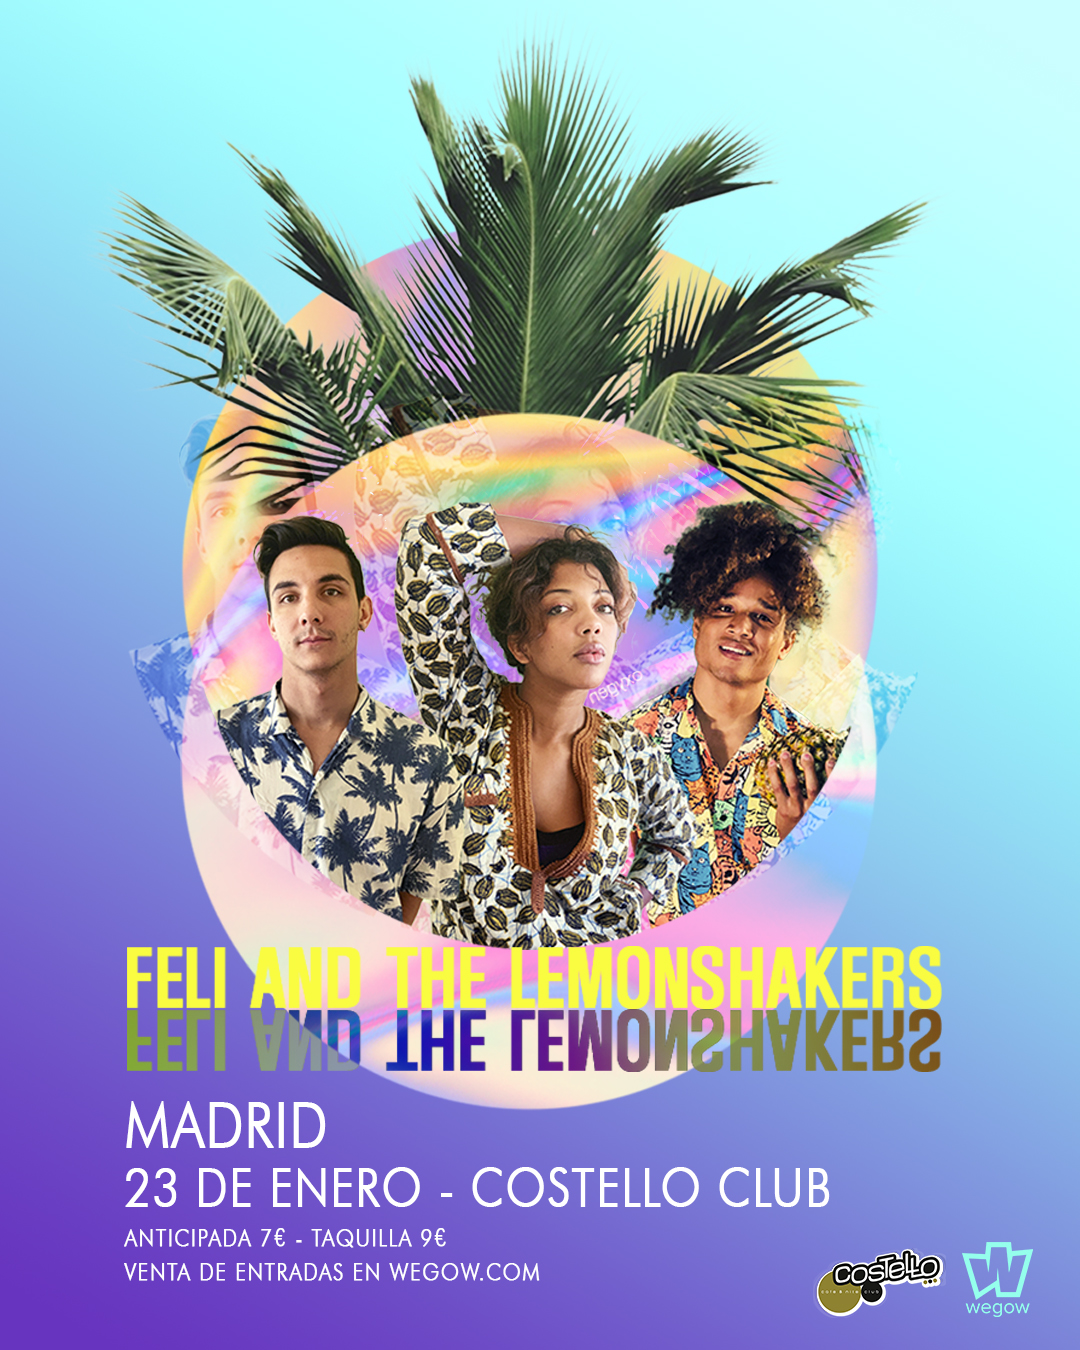 Feli and the LemonShakers - Costello Club